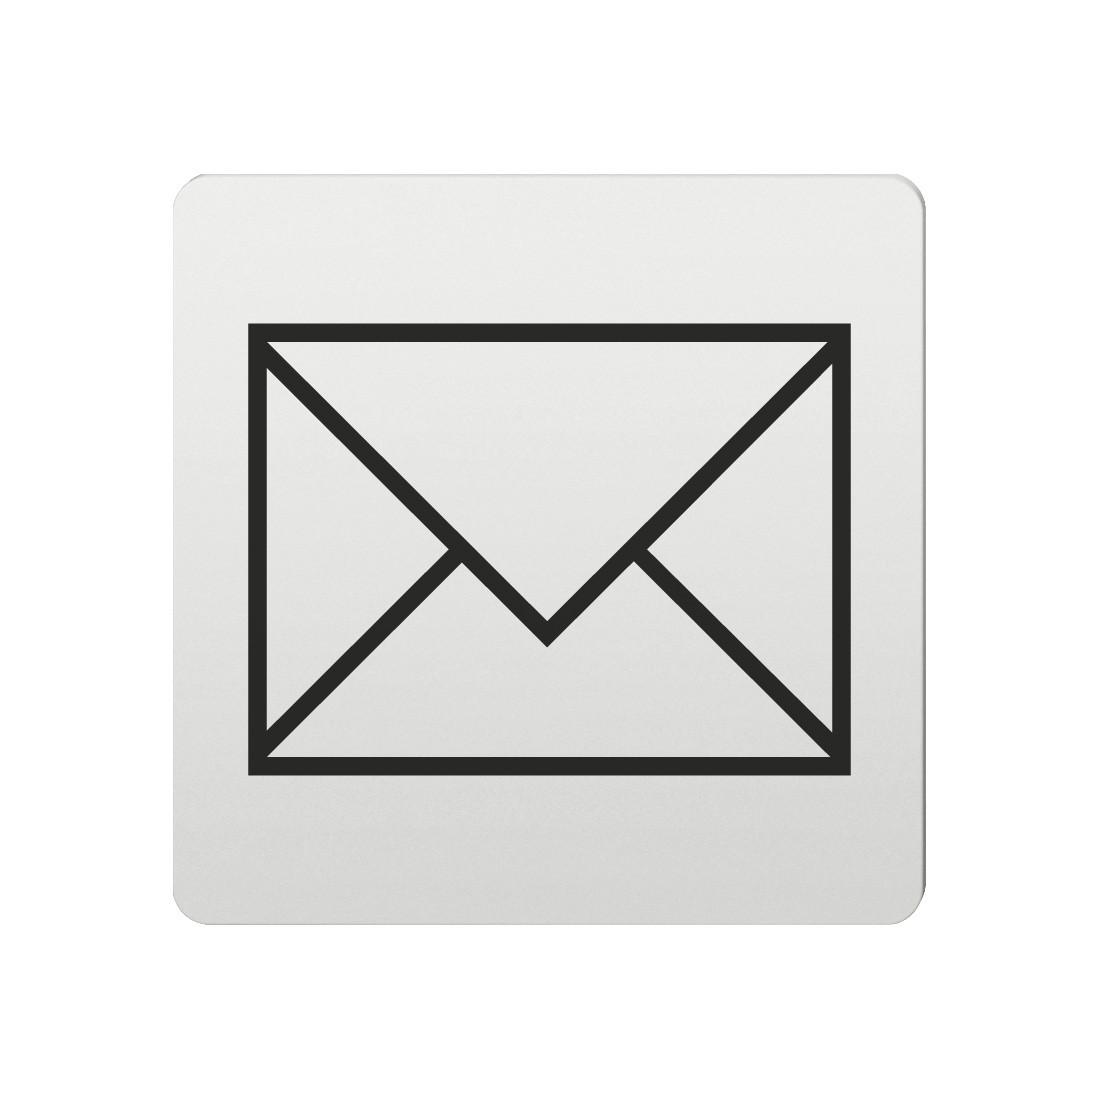 FSB Hinweiszeichen Post Lasergraviert Aluminium naturfarbig (0 36 4059 00210 0105)